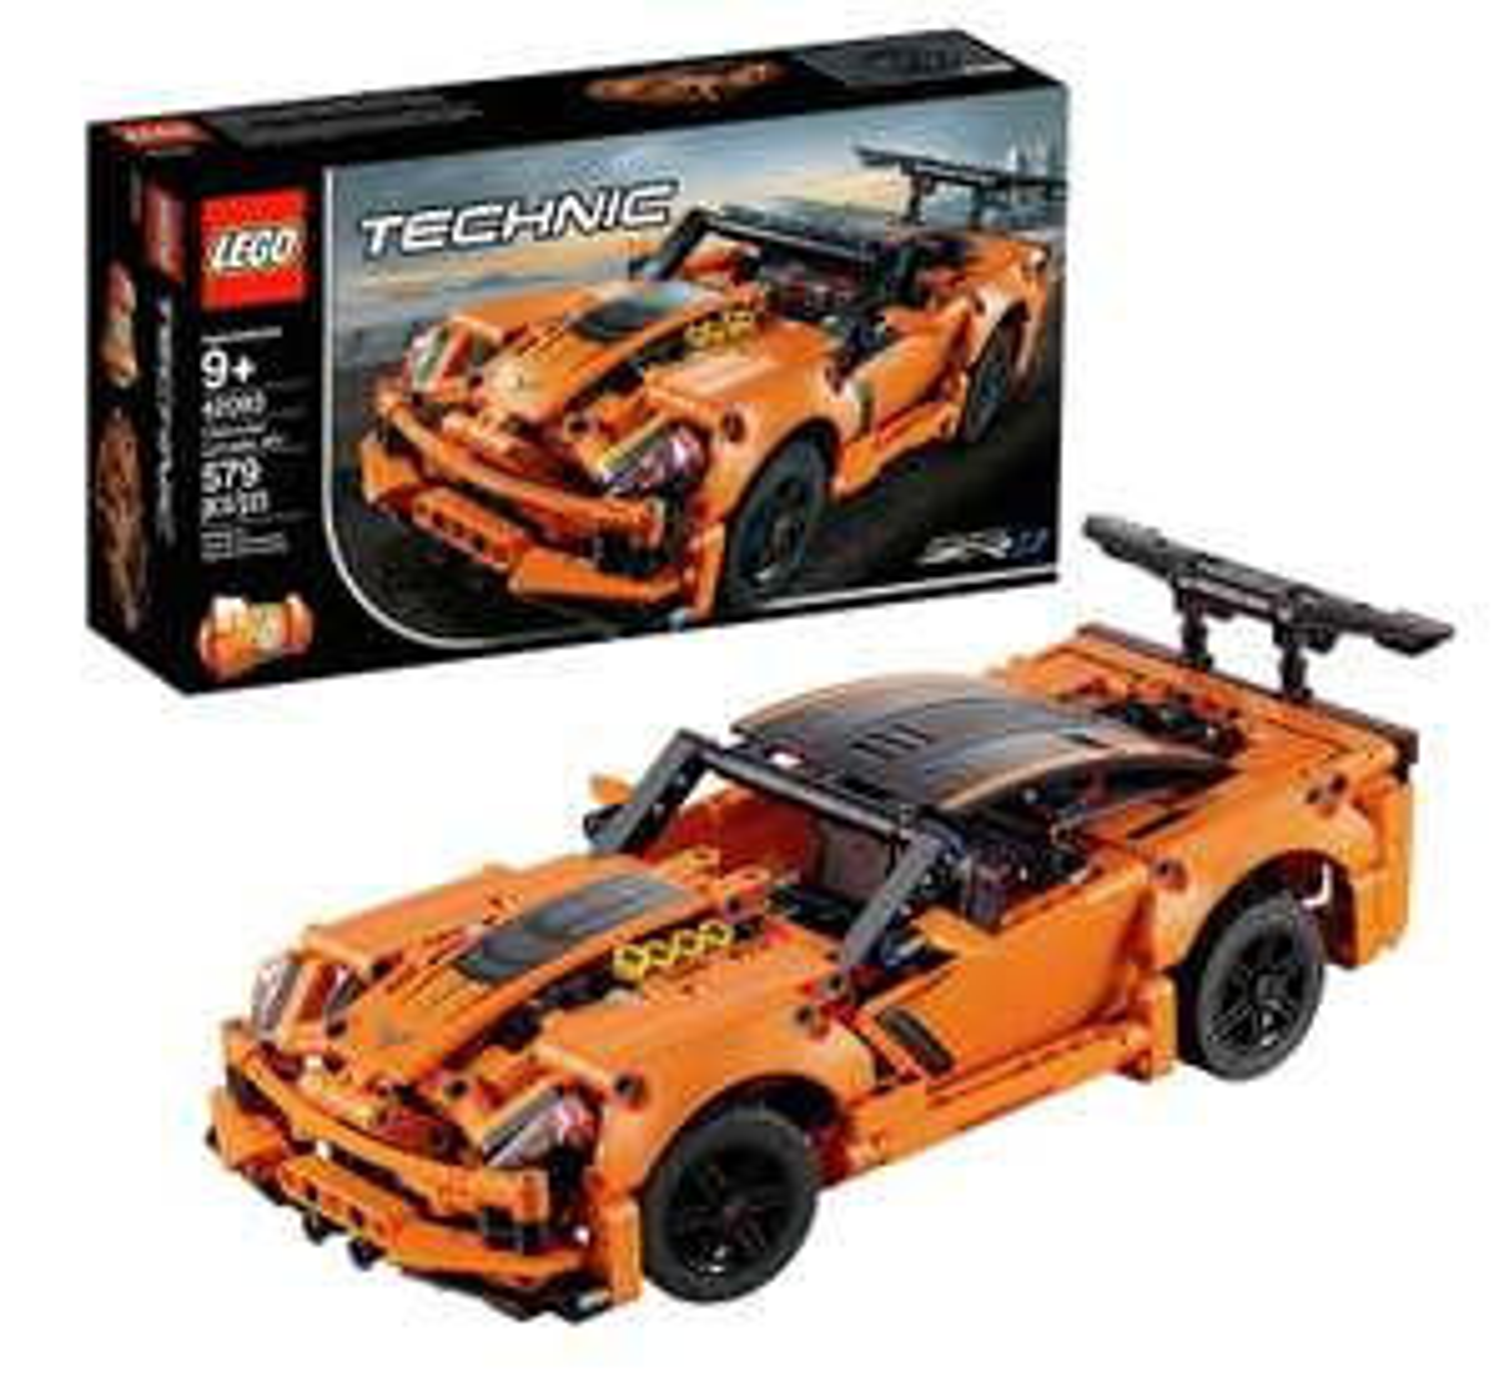 LEGO Technic Chevrolet Corvette ZR1 Rally Car Set - 42093 for £21 @ Argos eBay (free click and collect)